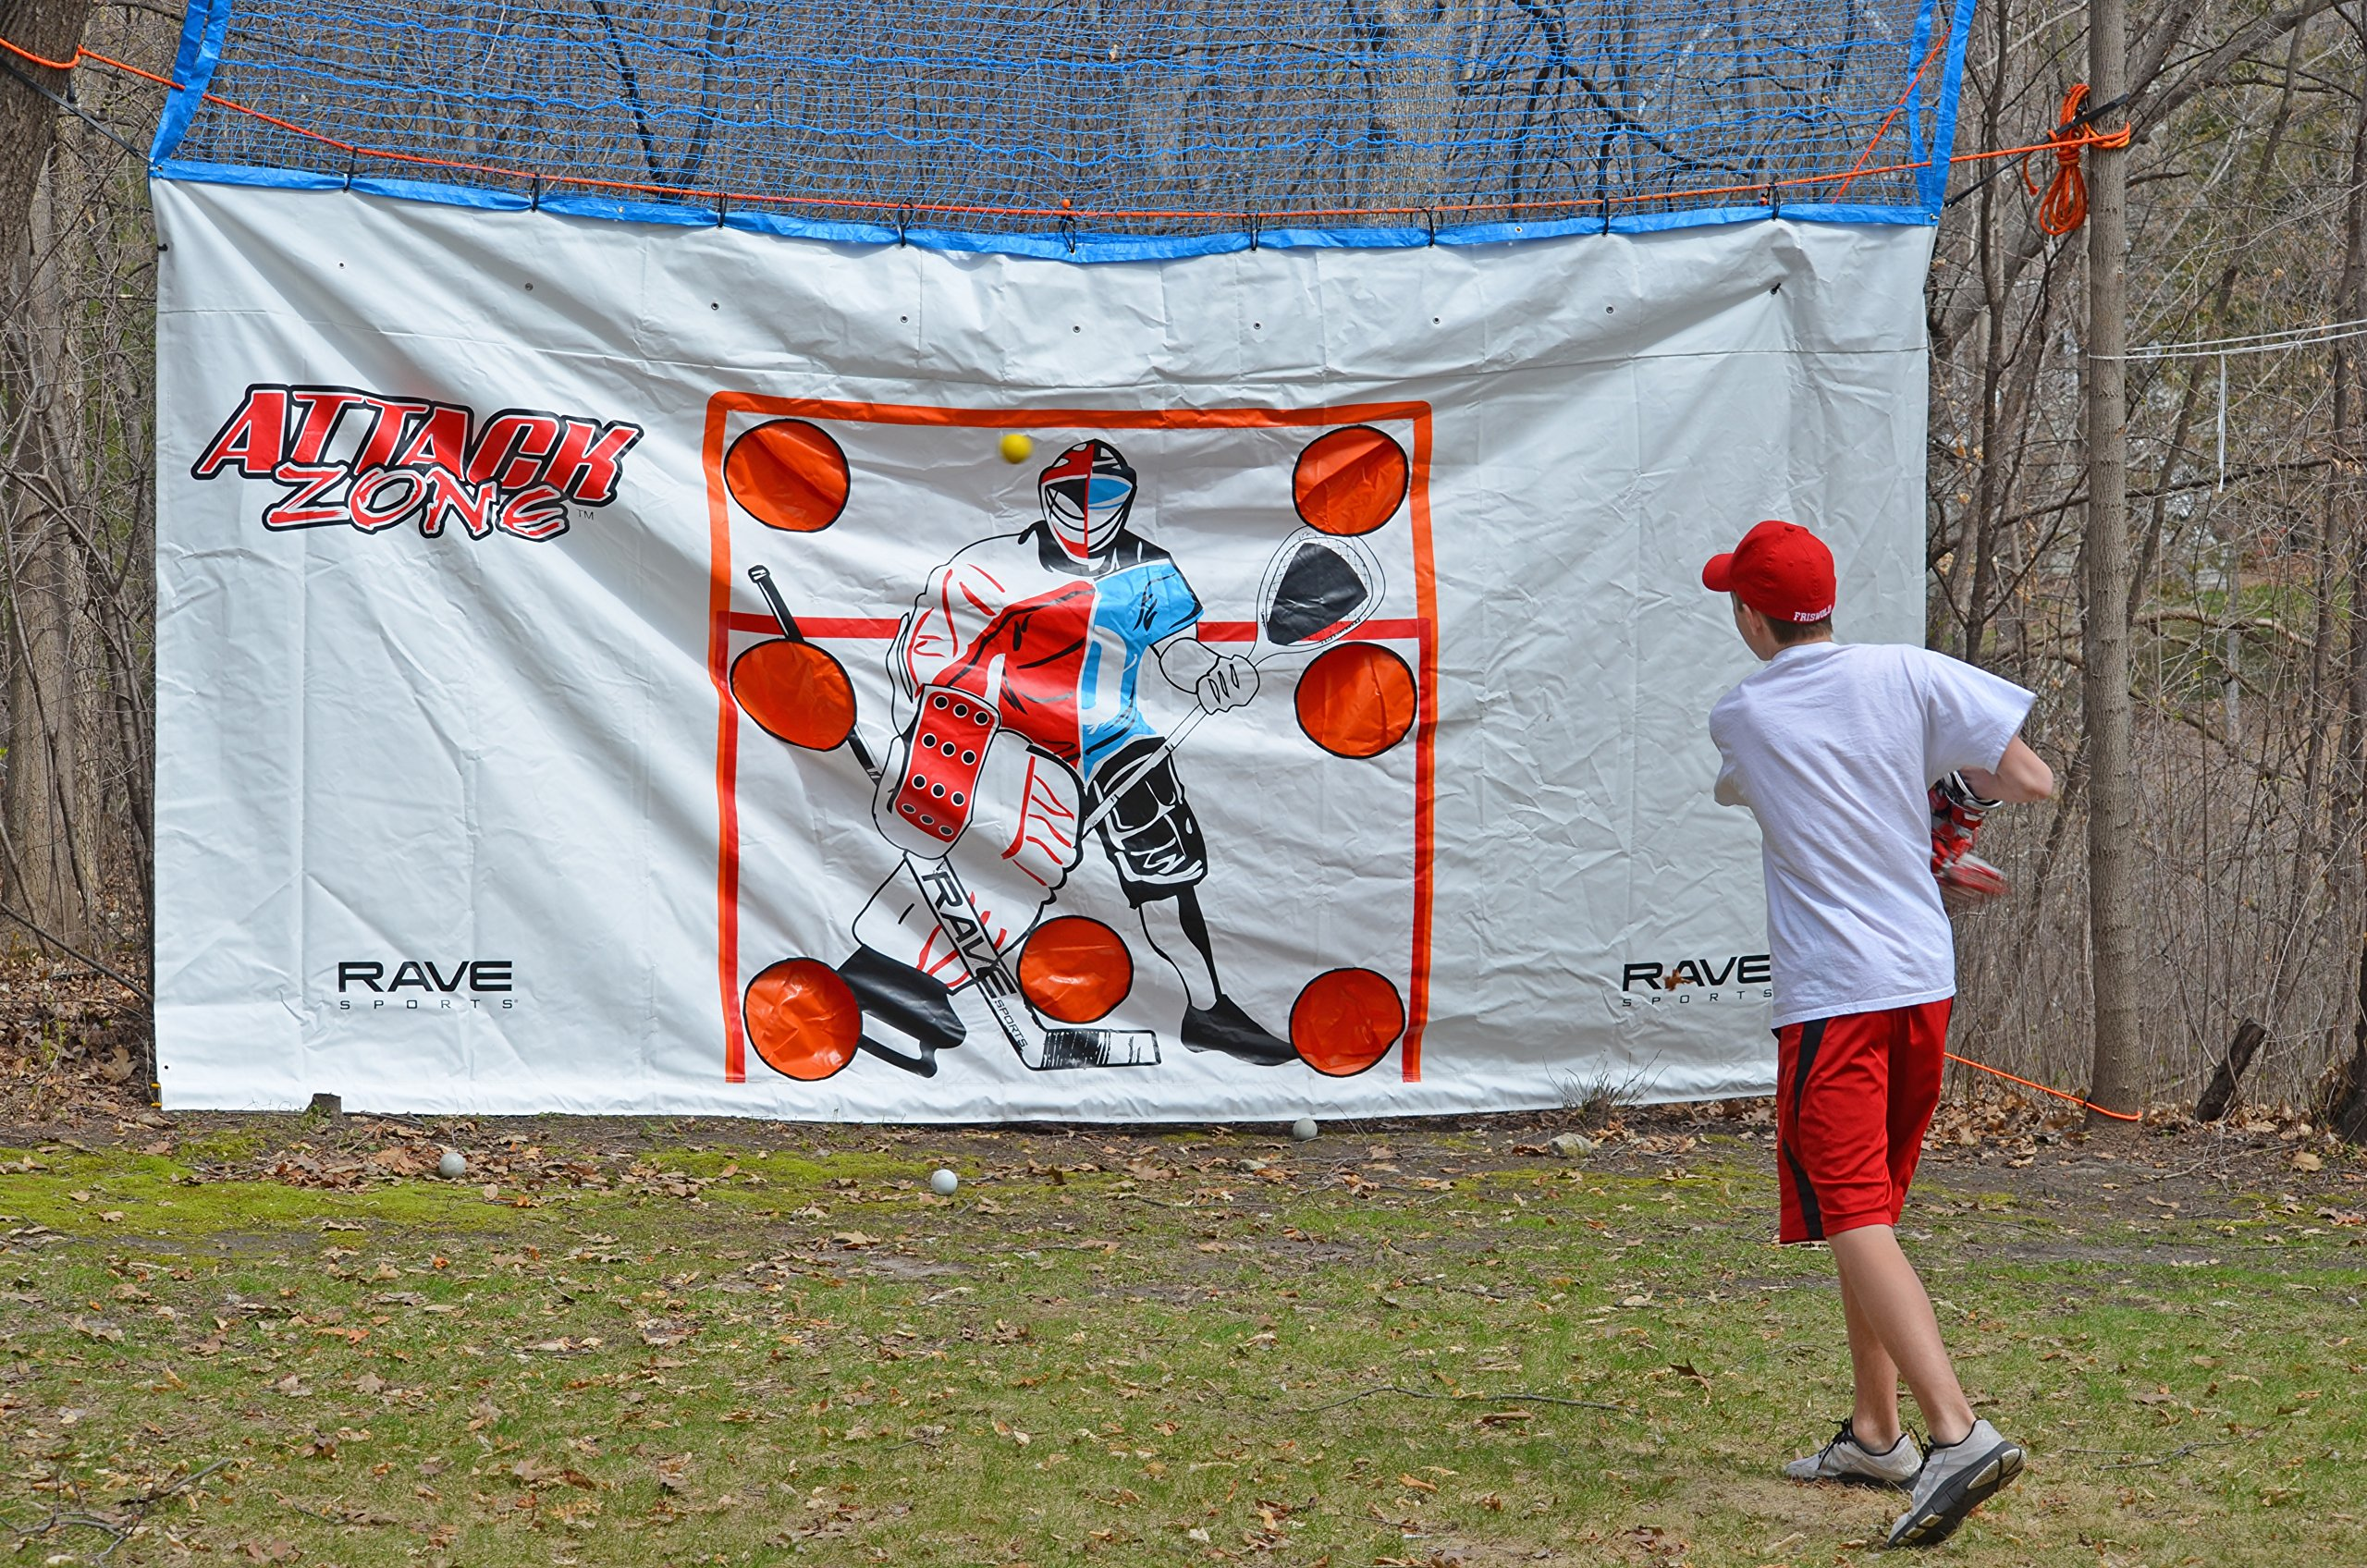 RAVE Sports Attack Zone 16' x 8' Hockey/Lacrosse Tarp